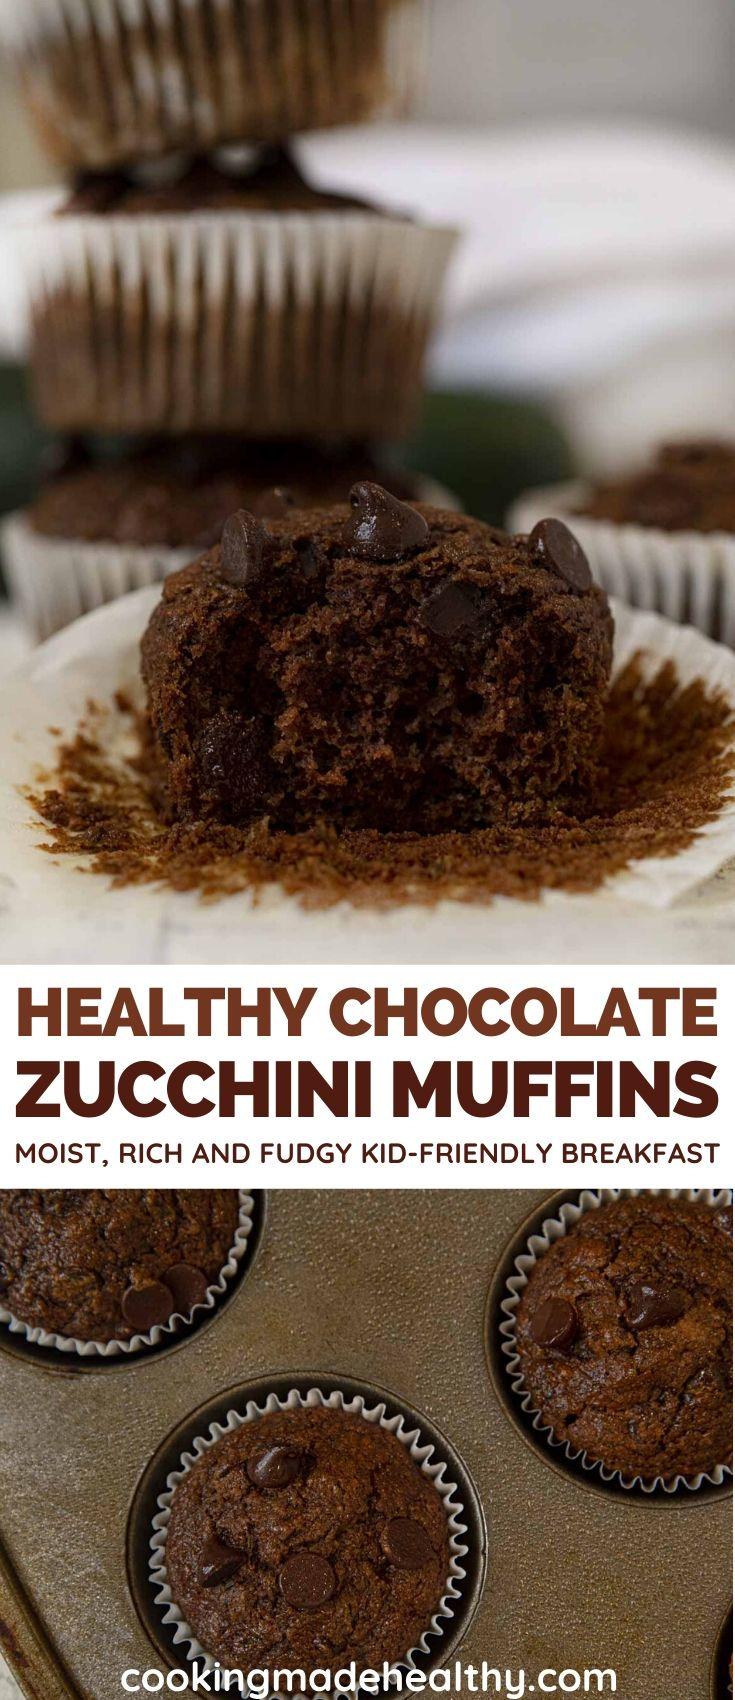 Healthy Chocolate Zucchini Muffins collage